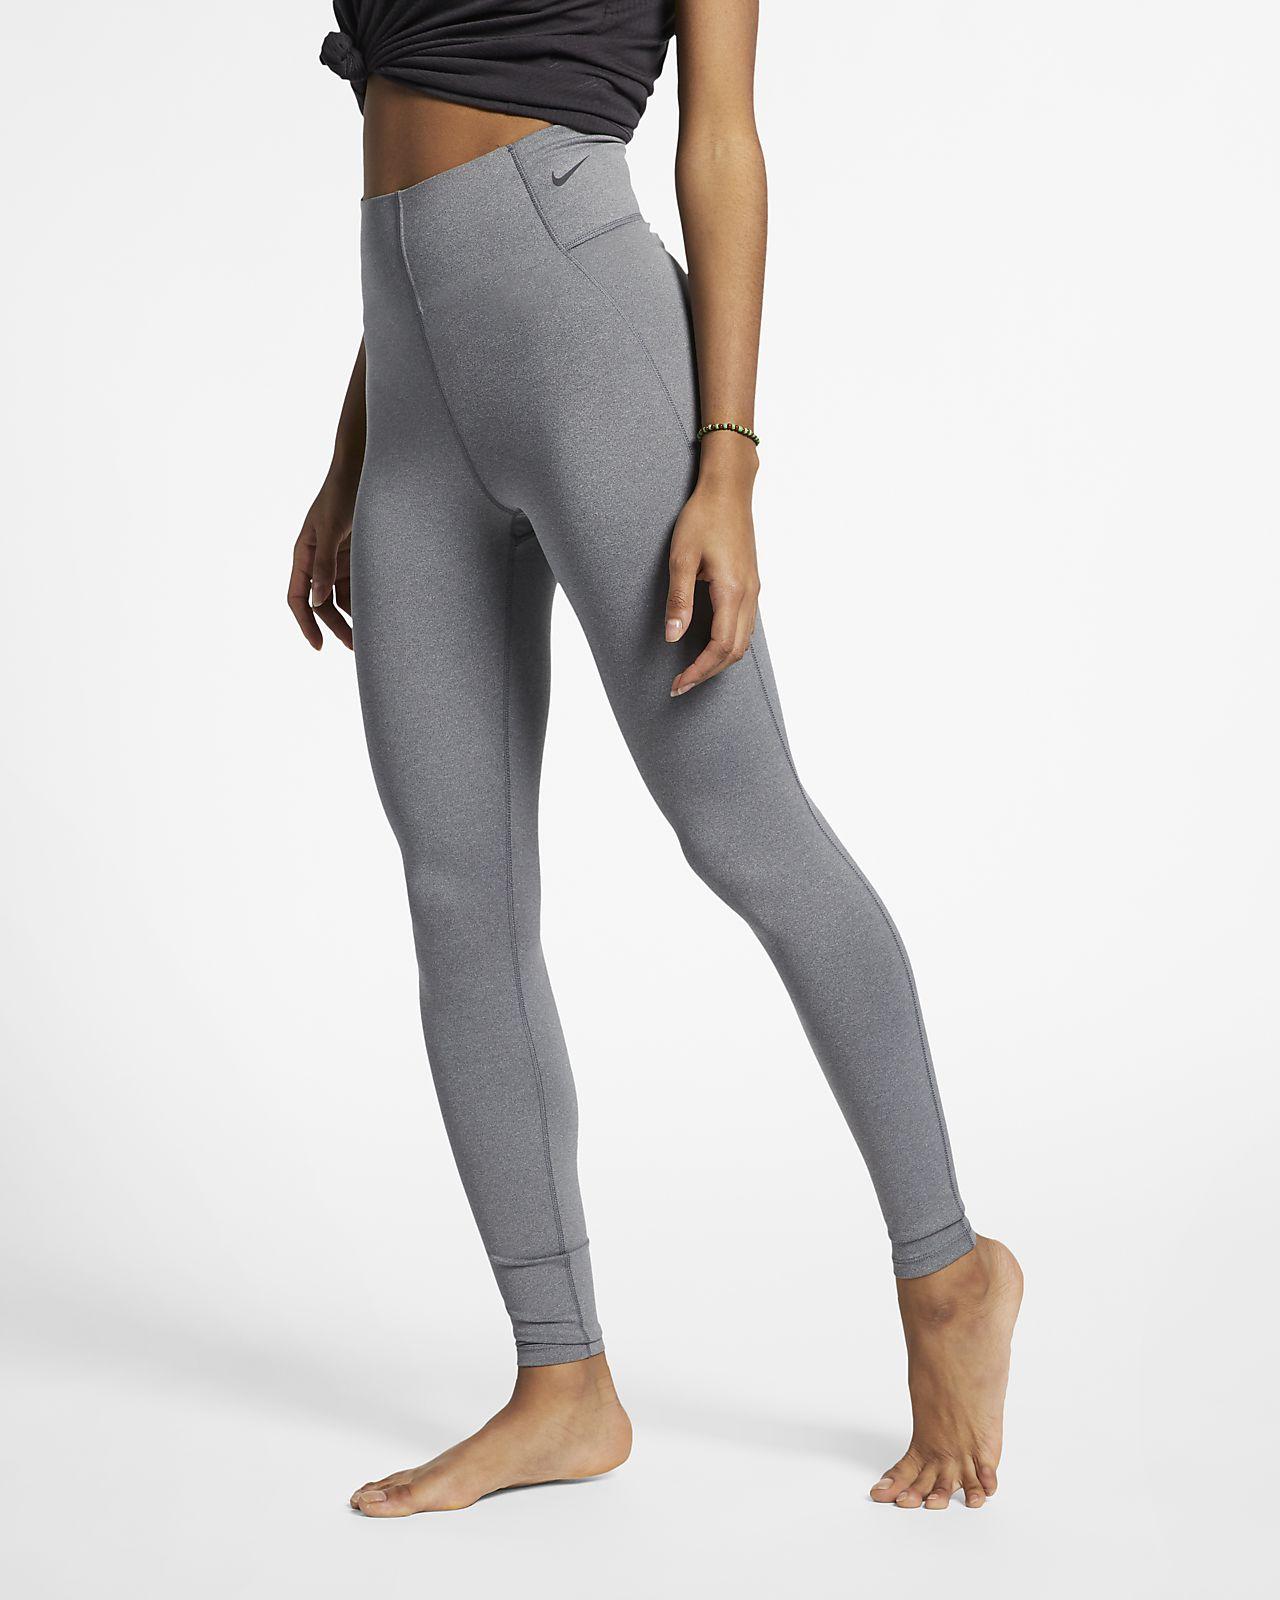 Nike Sculpt Women's Yoga Training Tights